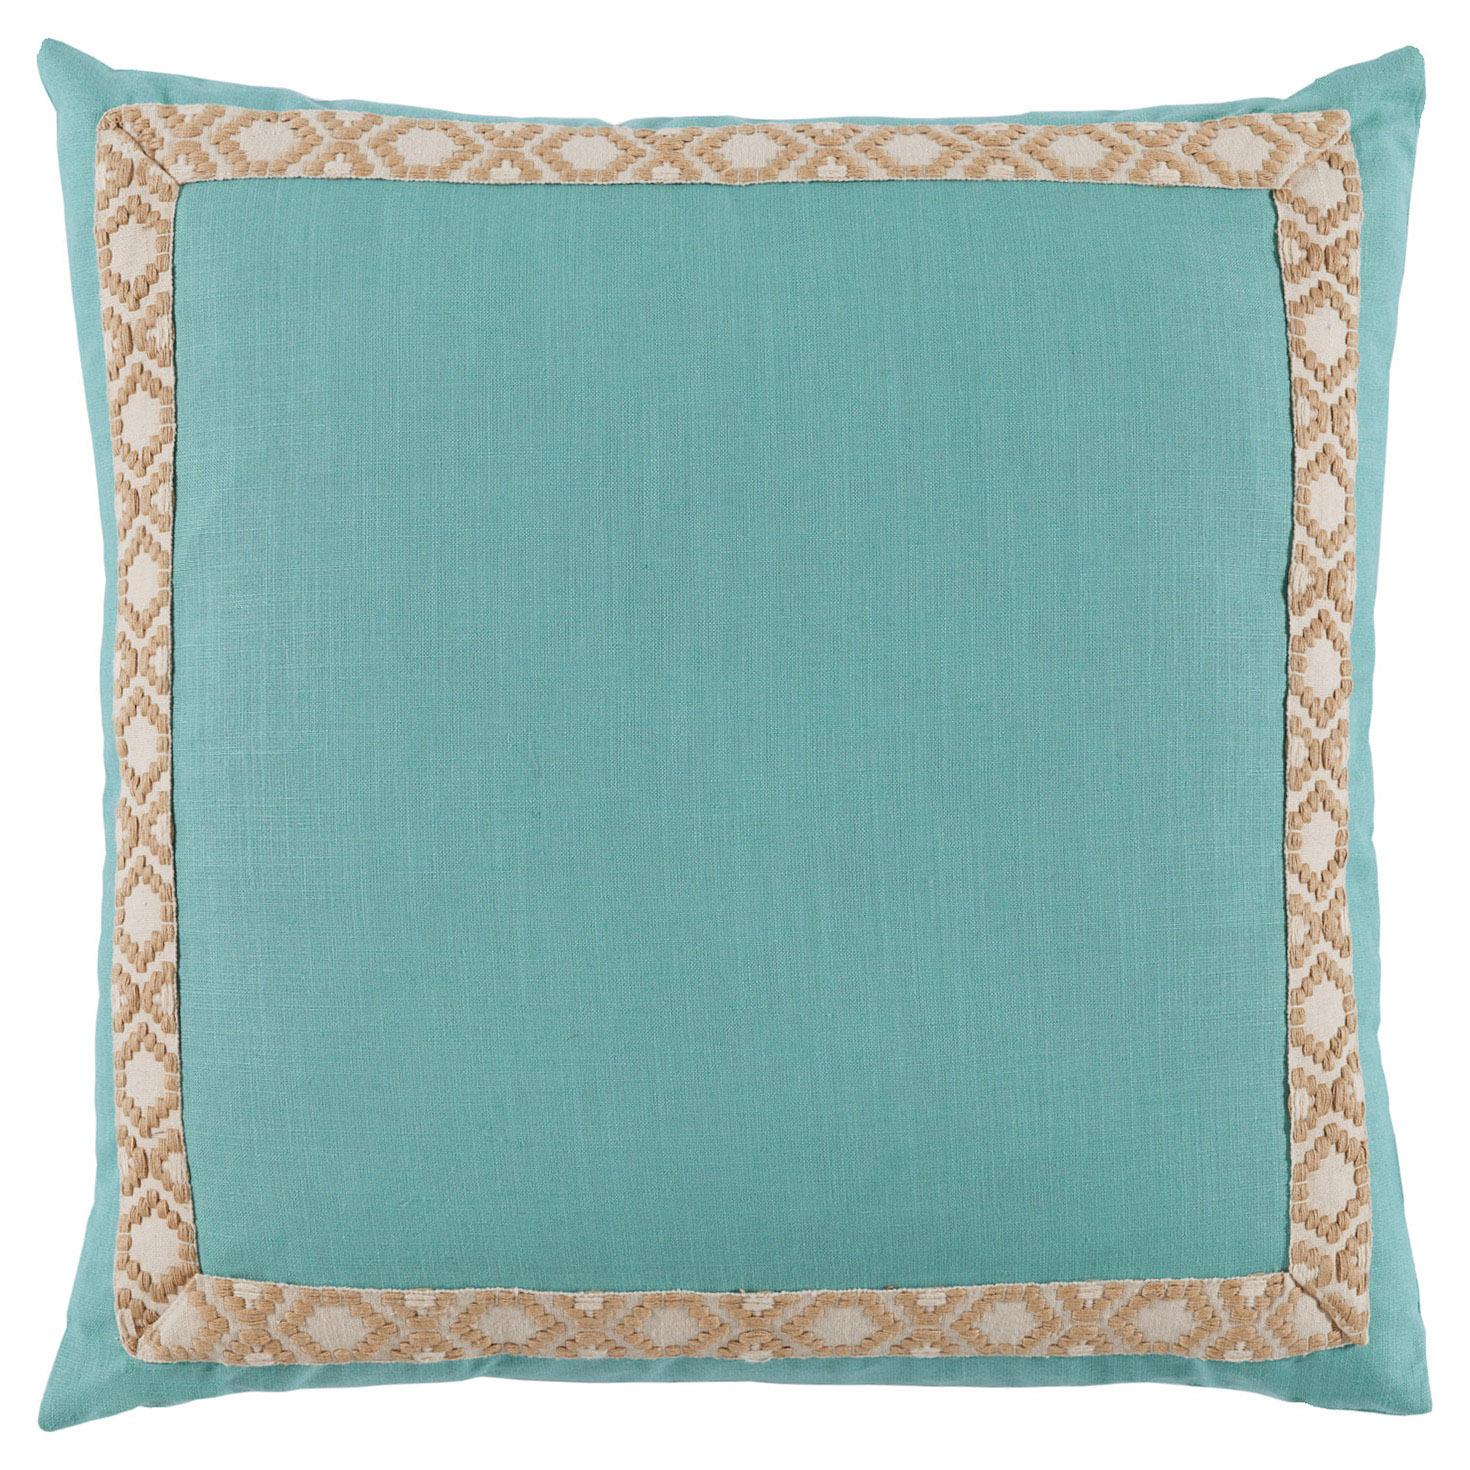 Kaia Global Aqua Linen Trim Band Pillow - 24x24